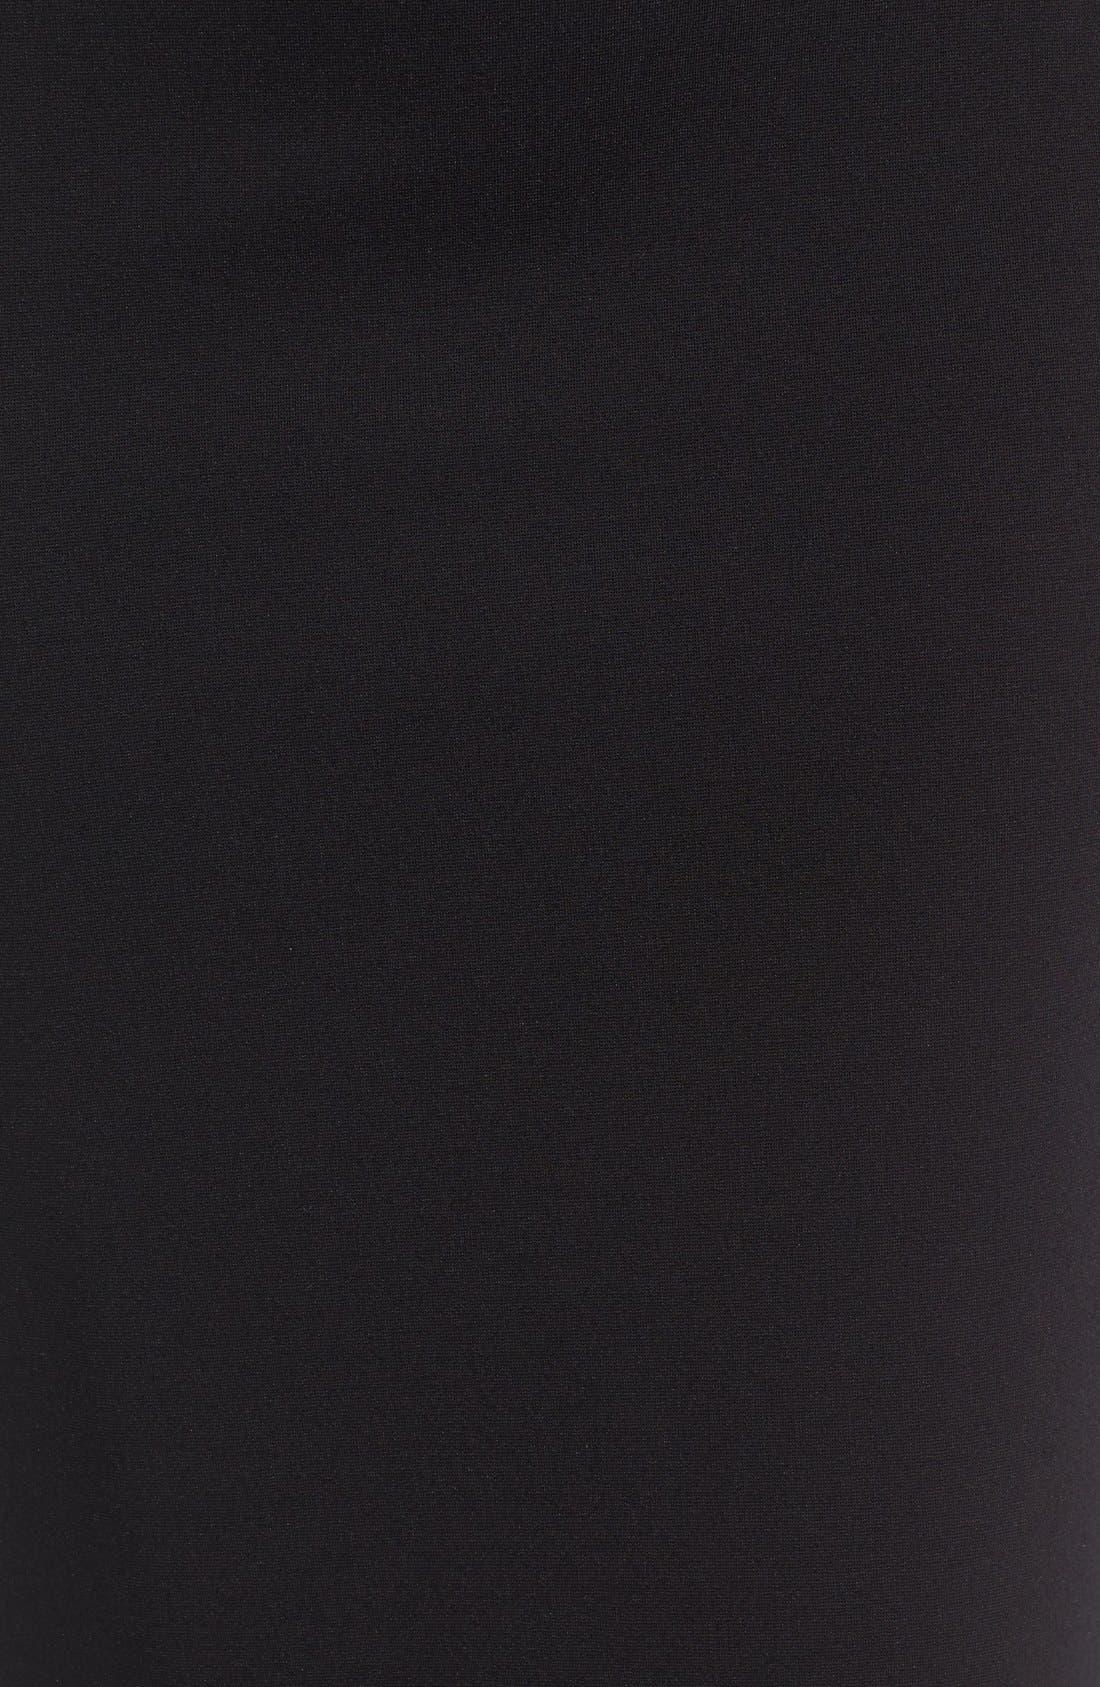 VINCE CAMUTO, Ponte Midi Skirt, Alternate thumbnail 4, color, RICH BLACK